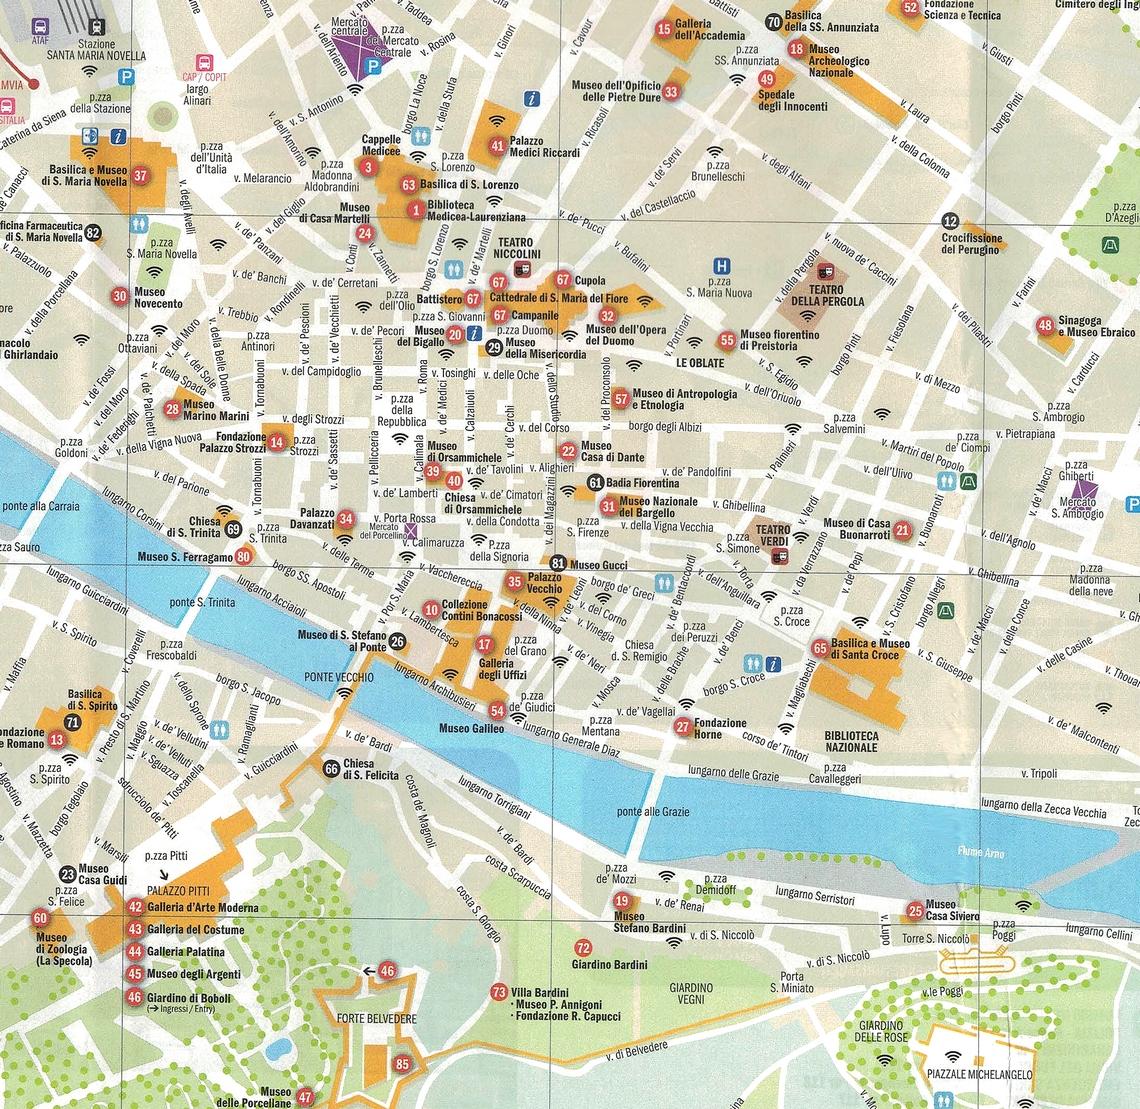 Firenze Cartina Centro Storico.Mappa Turistica Di Firenze